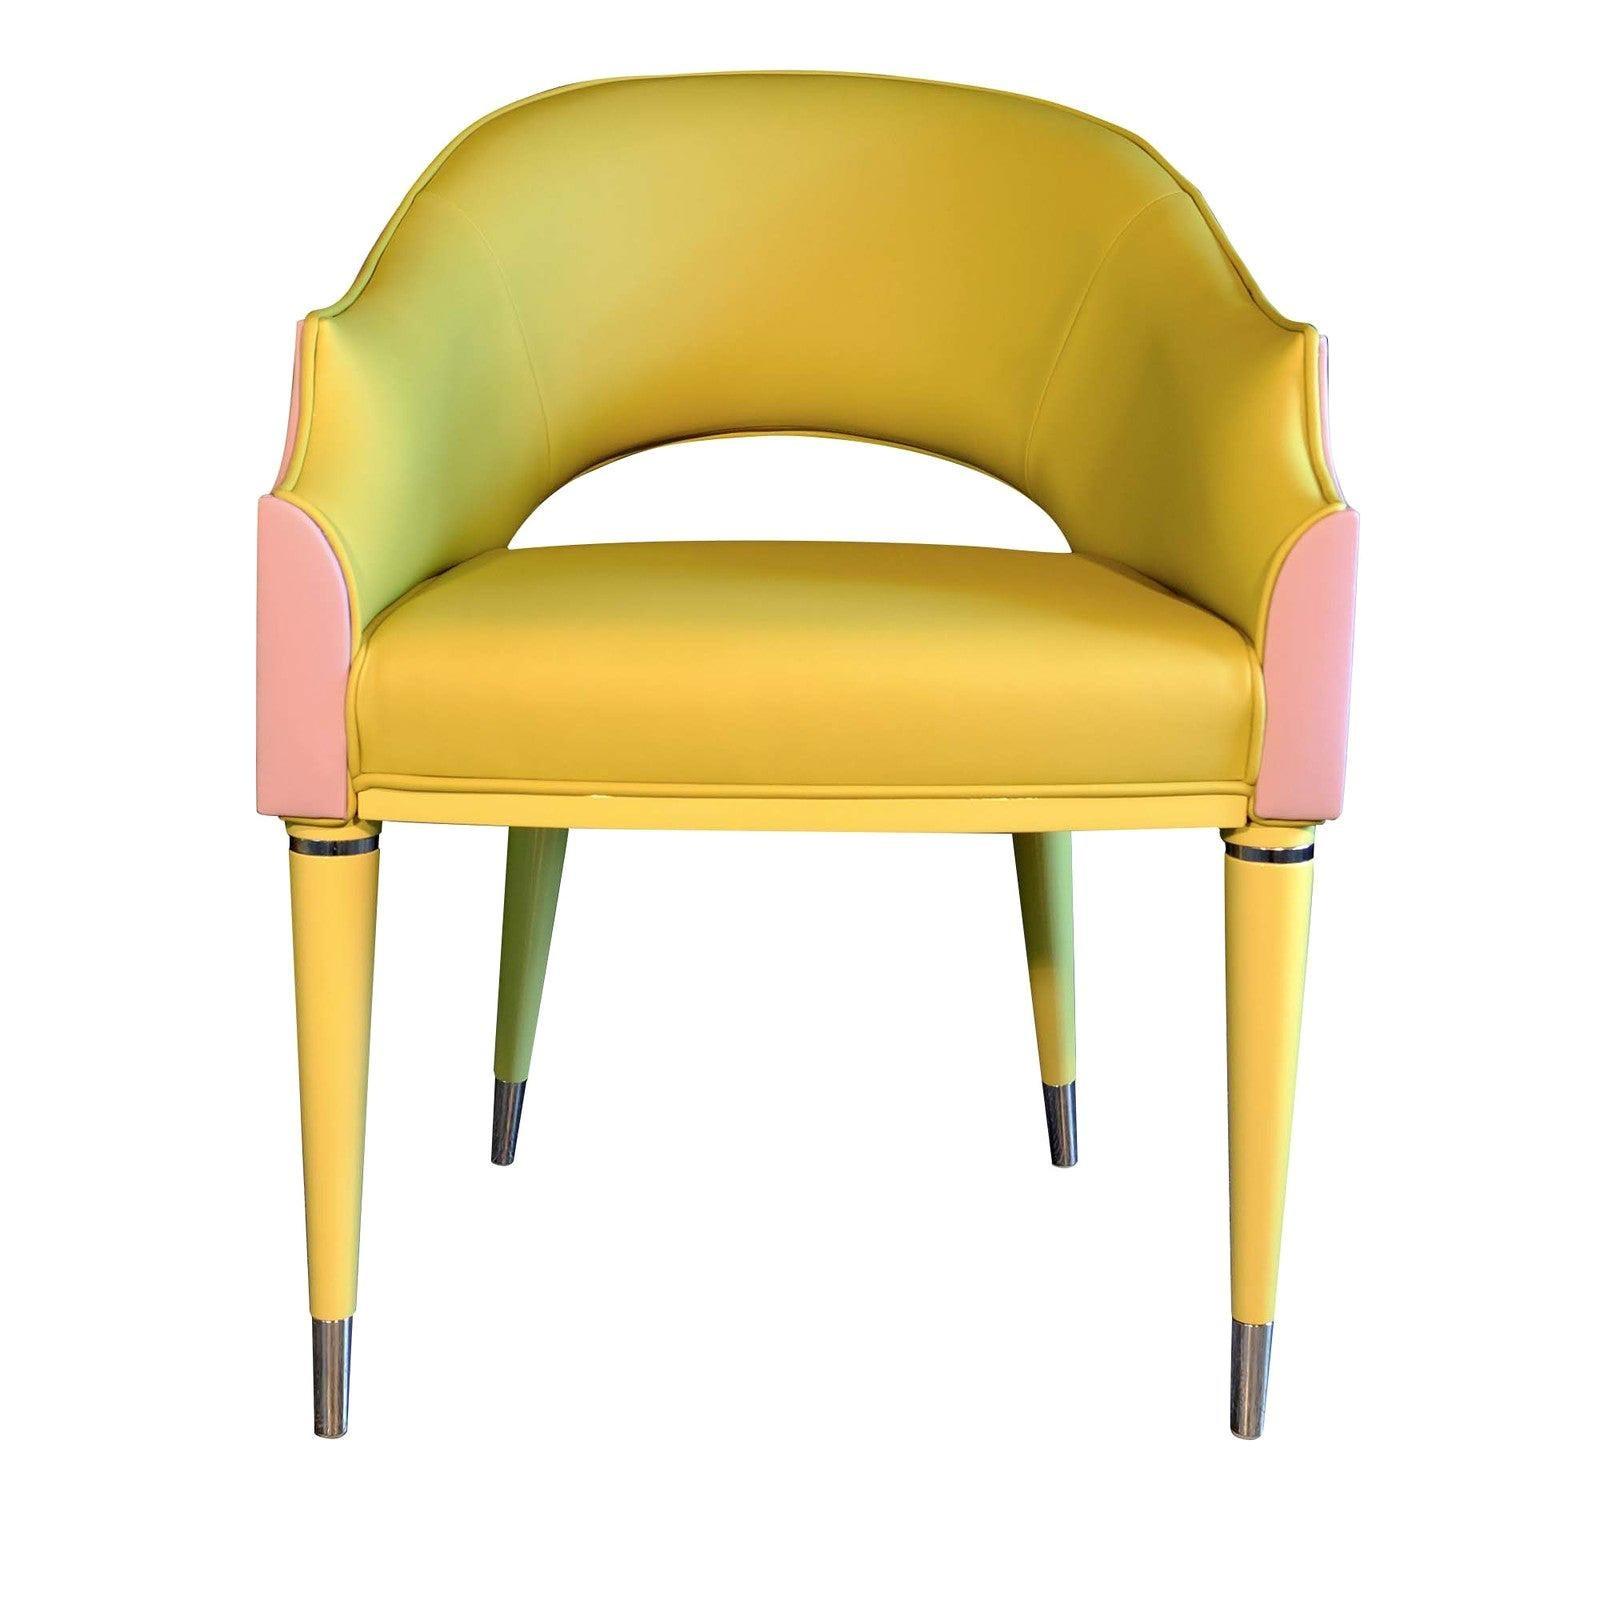 Crast Multi-Color Armchair